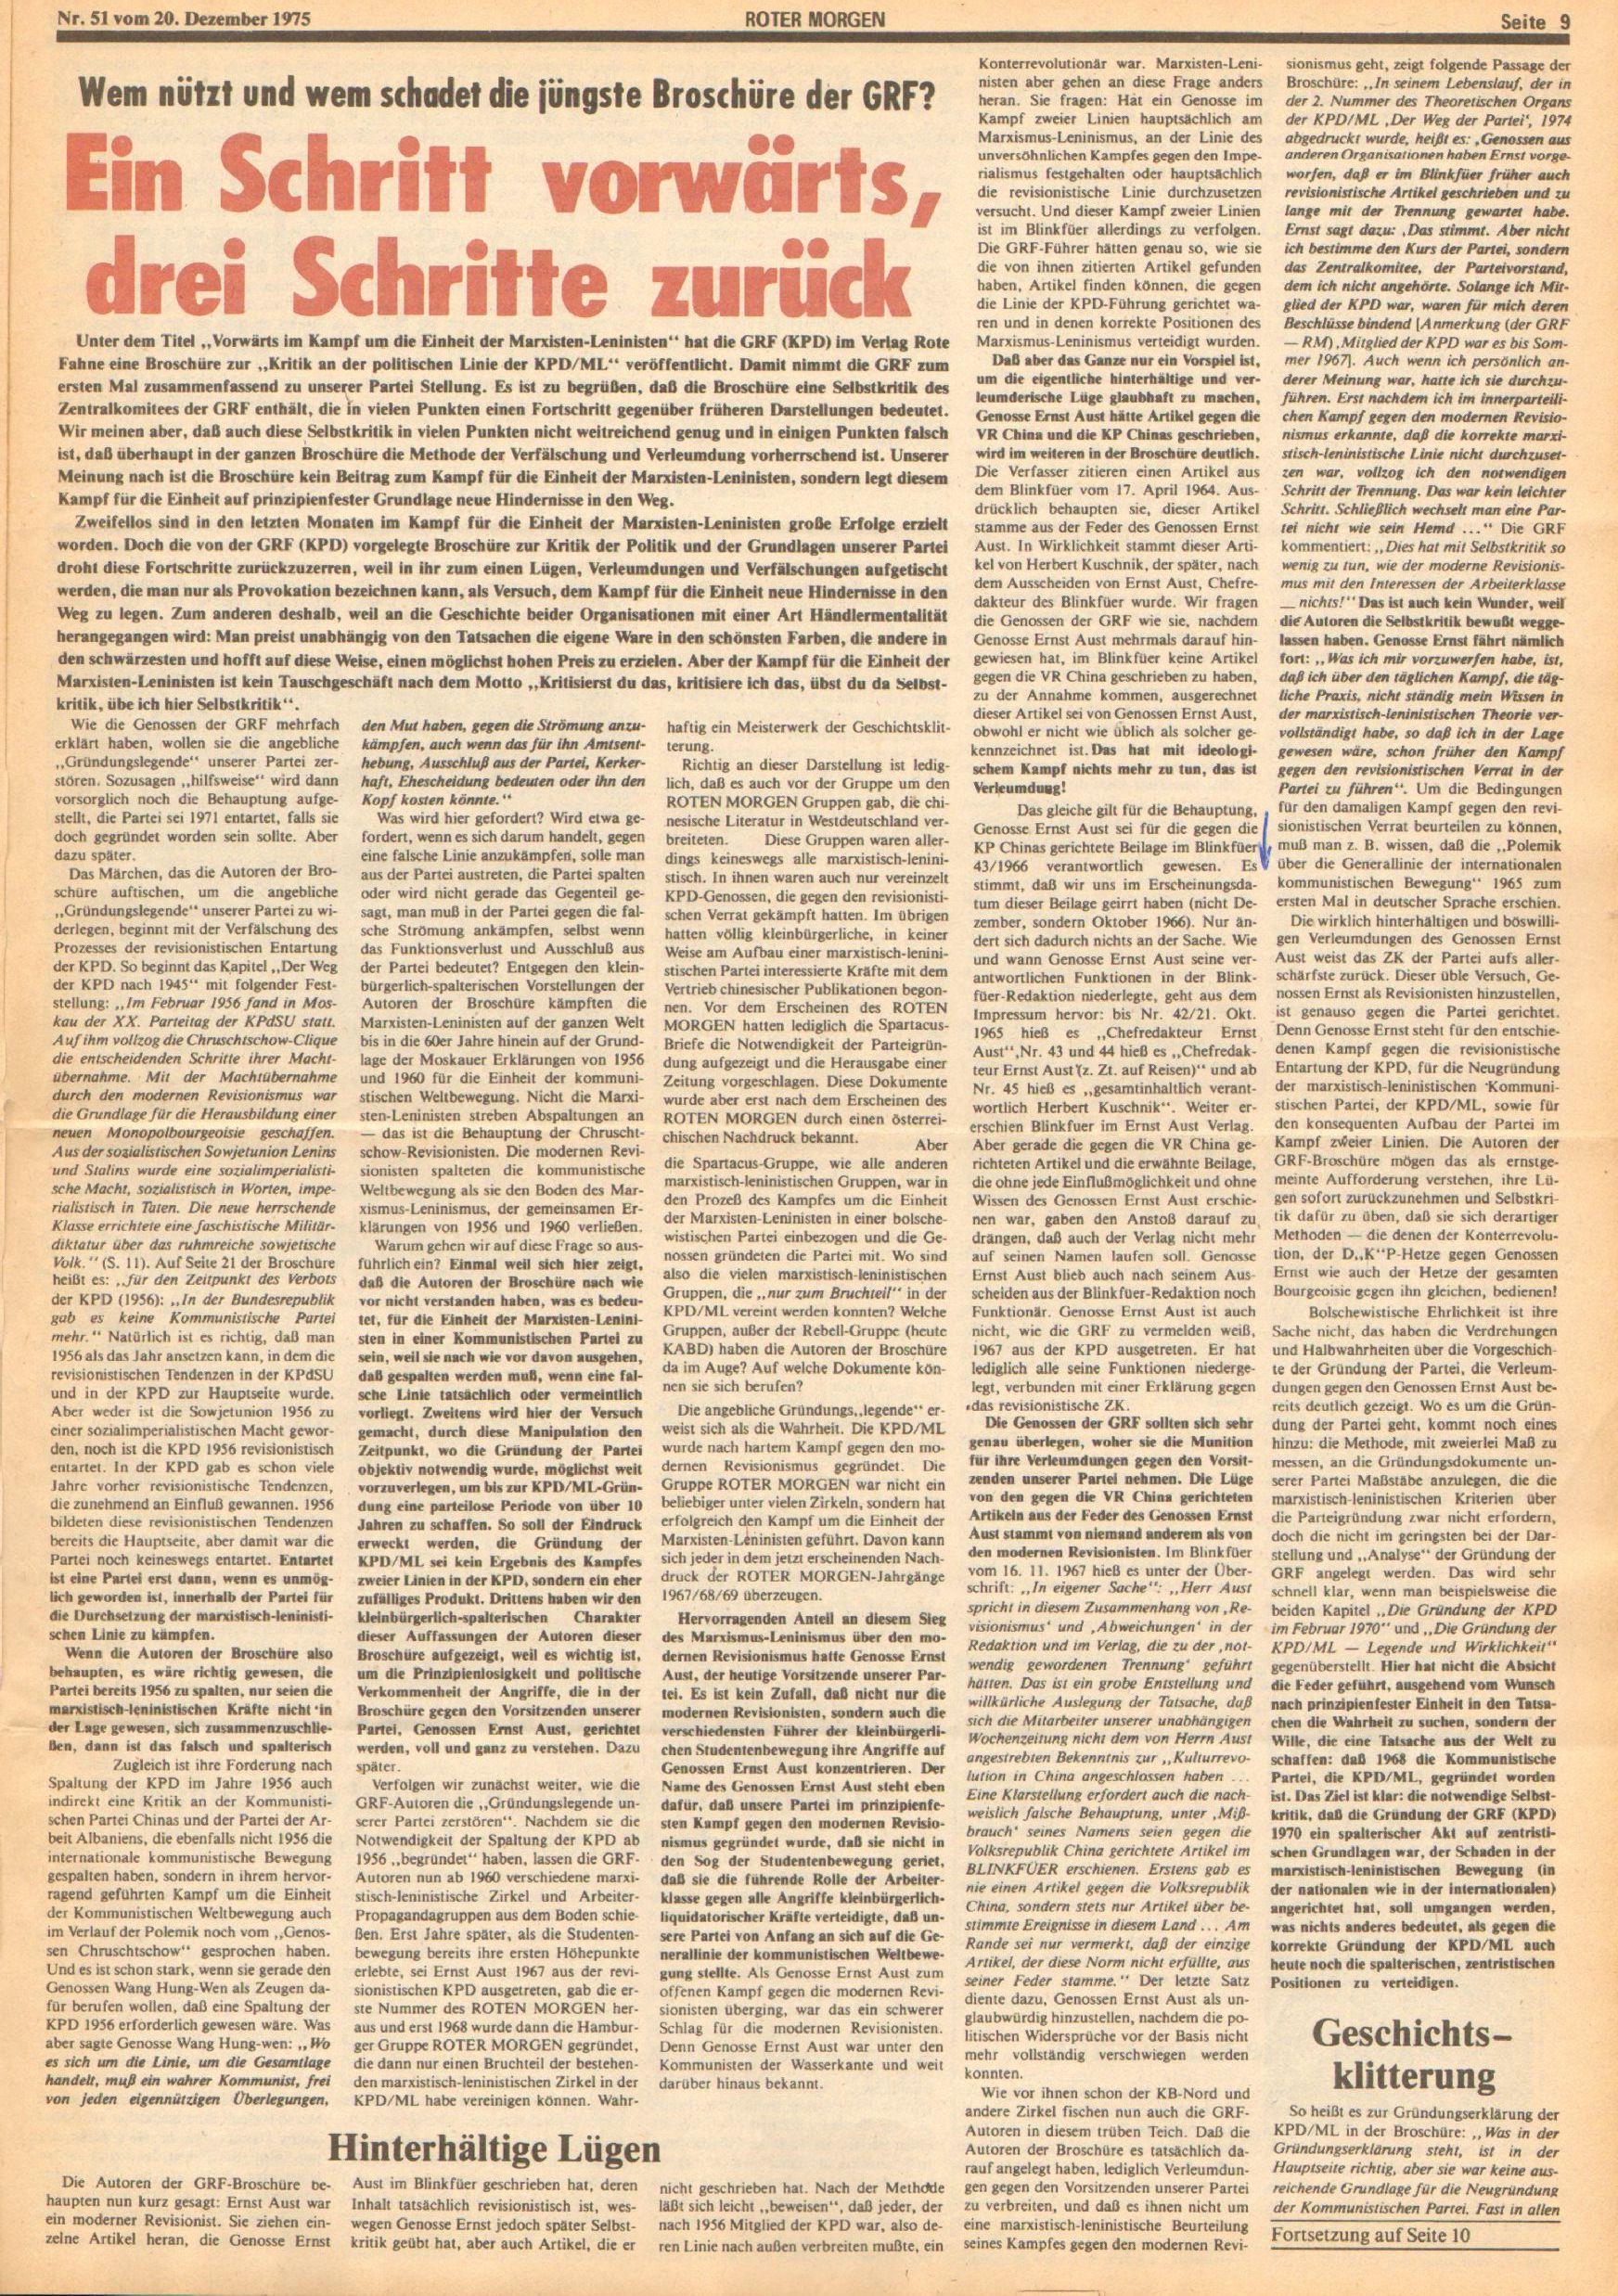 Roter Morgen, 9. Jg., 20. Dezember 1975, Nr. 51, Seite 9